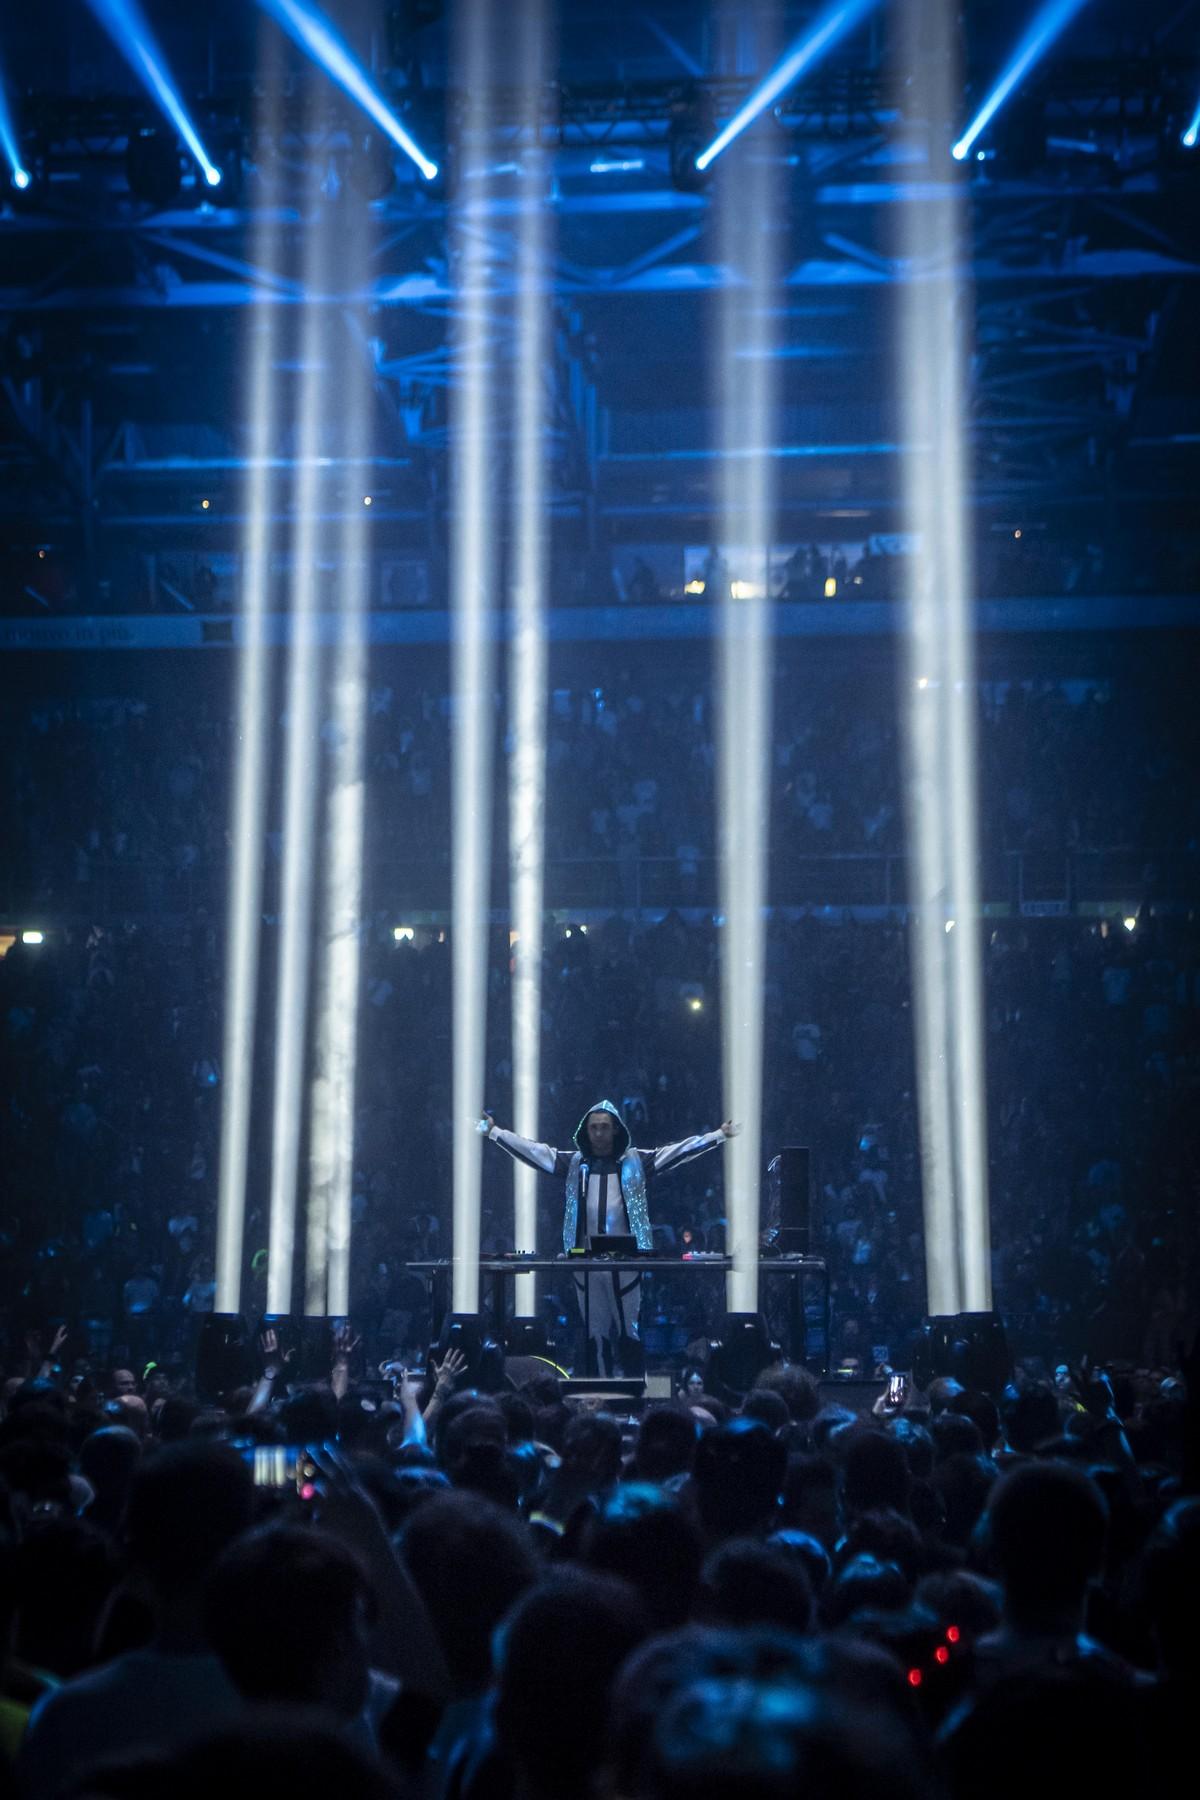 Cosmo concerto Forum Assago Milano 2019